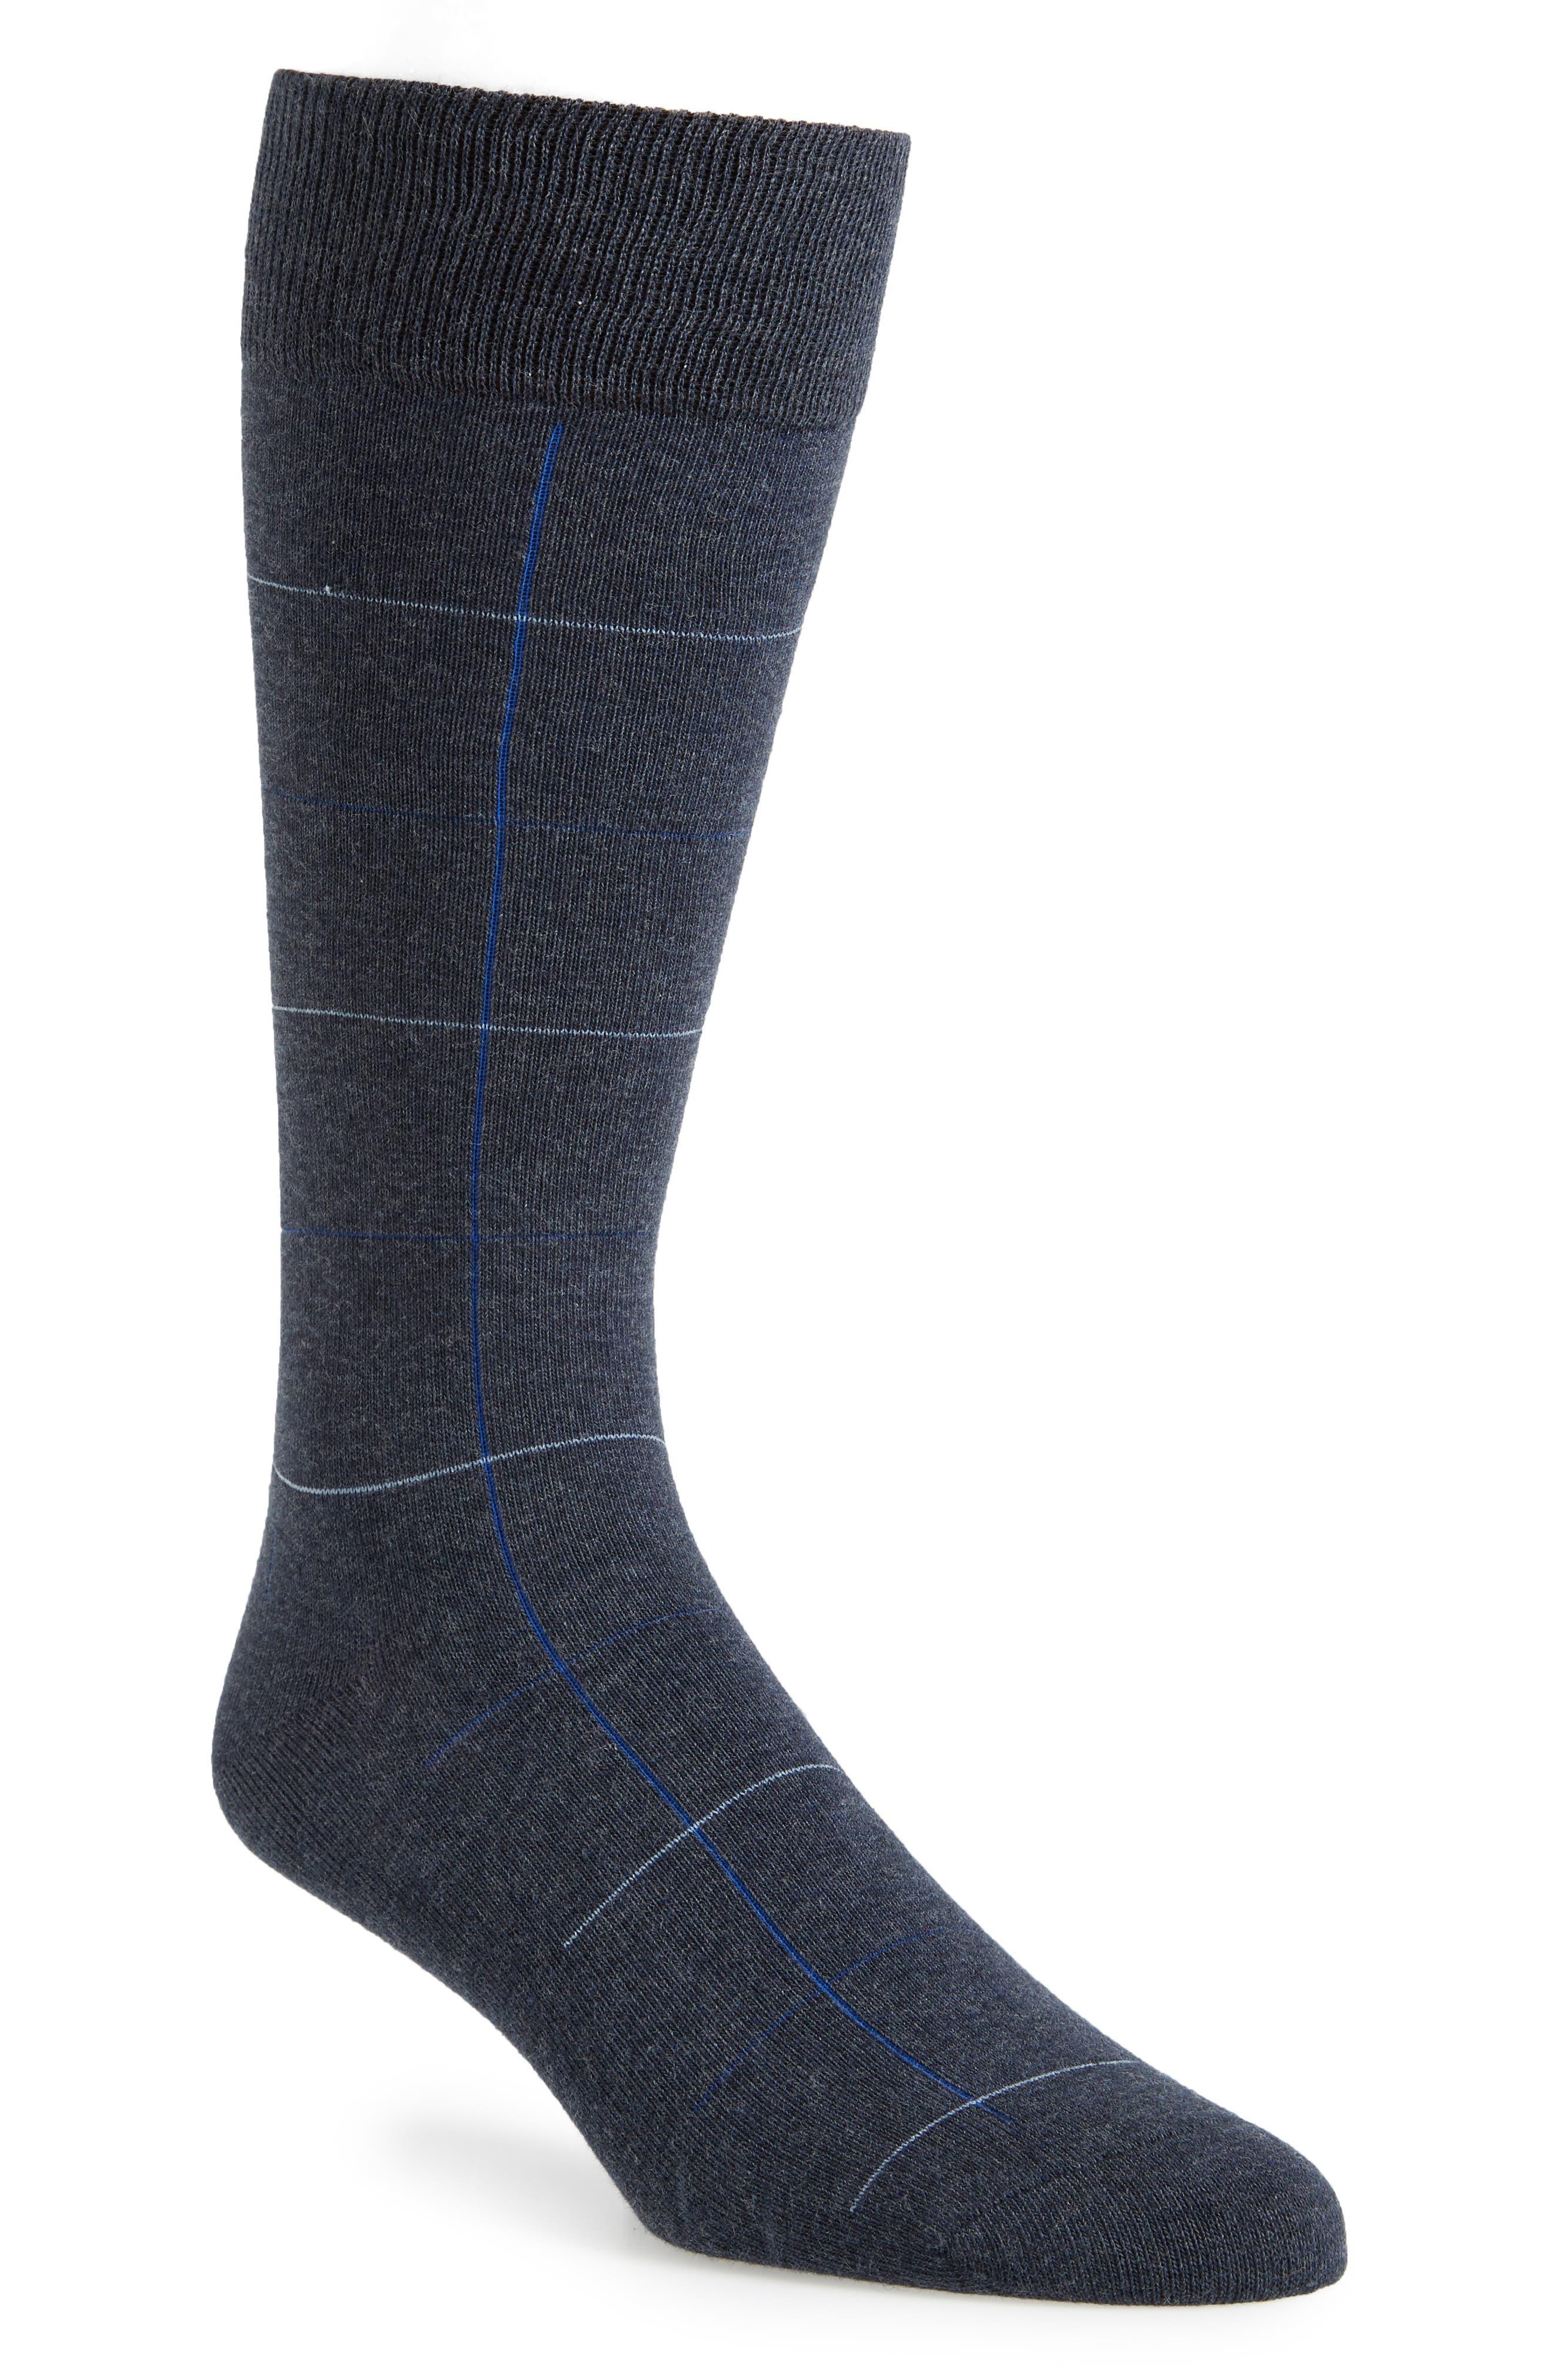 Check Socks,                             Main thumbnail 1, color,                             Navy Heather